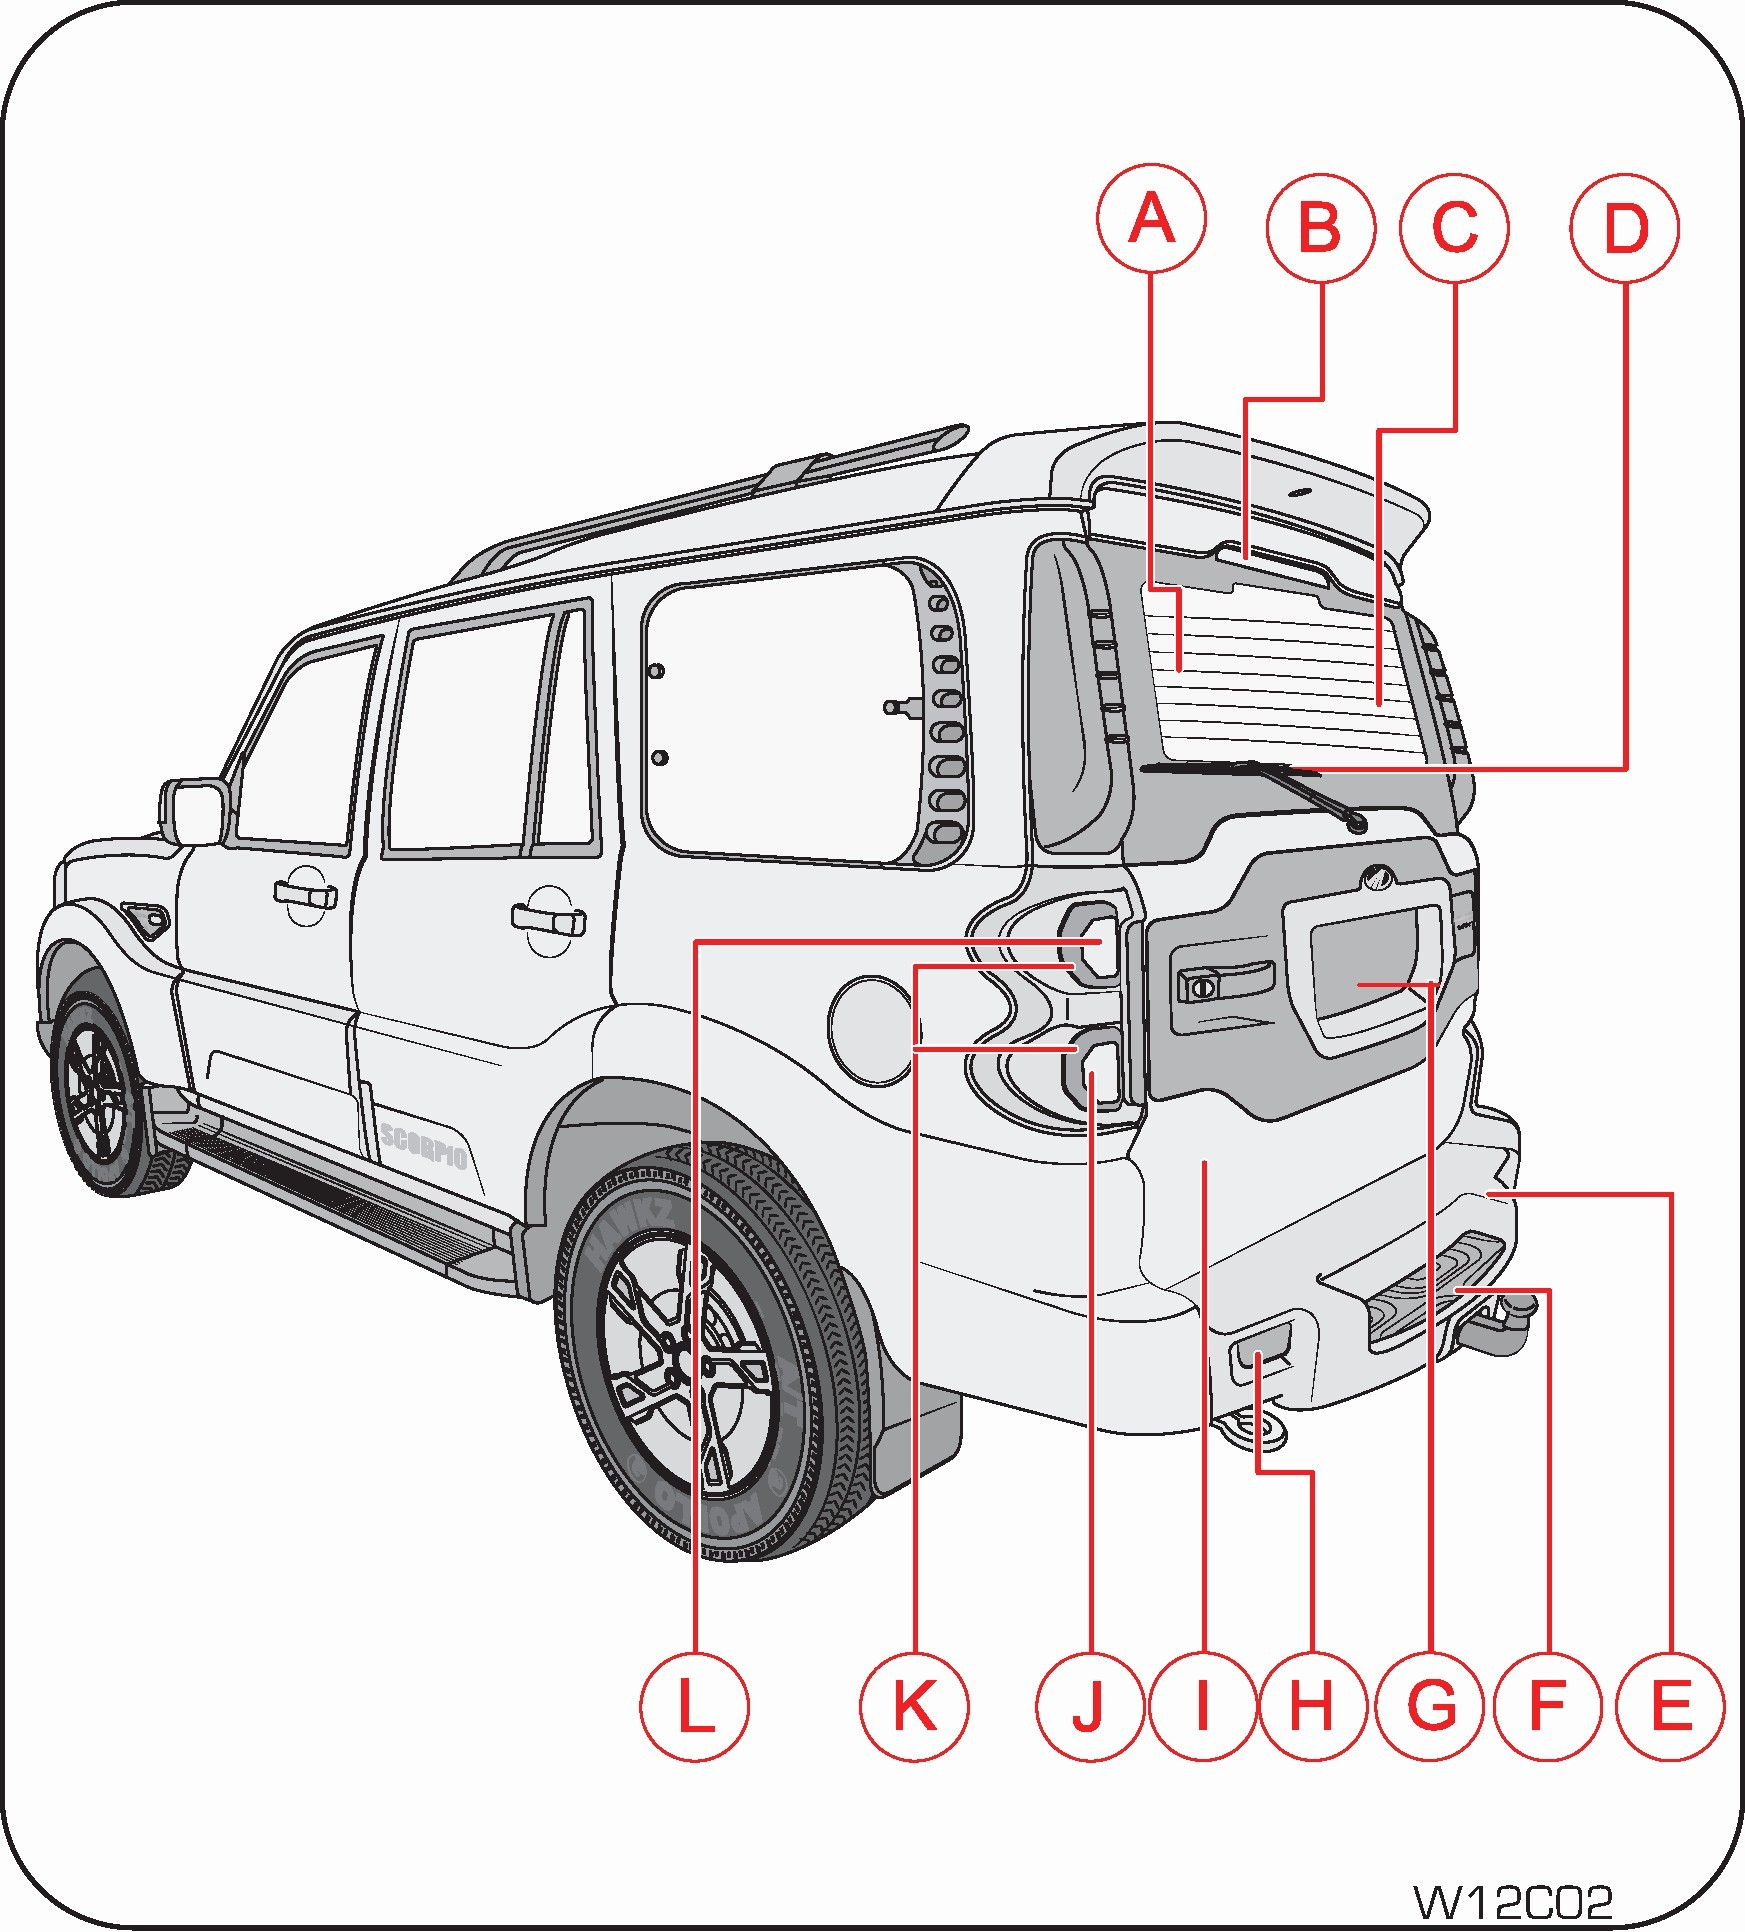 Car Under Hood Diagram Car Parts Diagram Under Hood Car Exterior Body Parts Diagram Of Car Under Hood Diagram